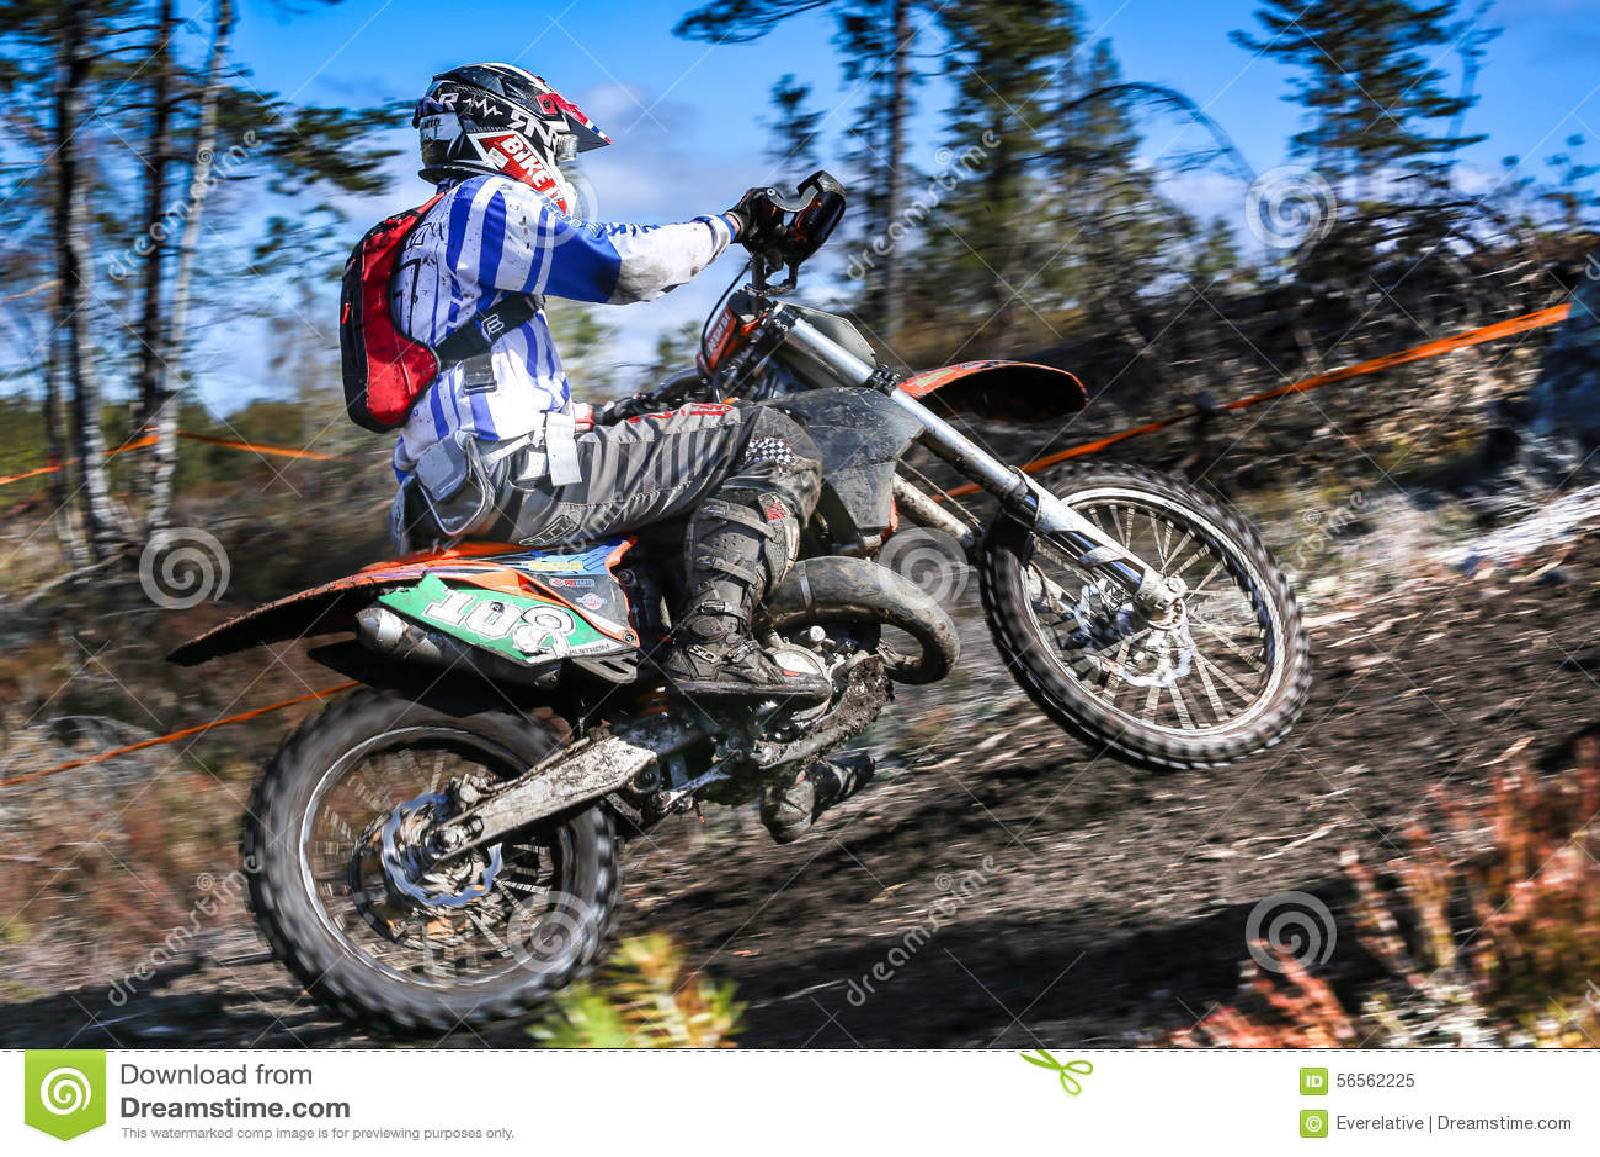 Download Αναβάτης Enduro στη μοτοσικλέτα του Εκδοτική εικόνα - εικόνα από διασκέδαση, αναβάτης: 56562225